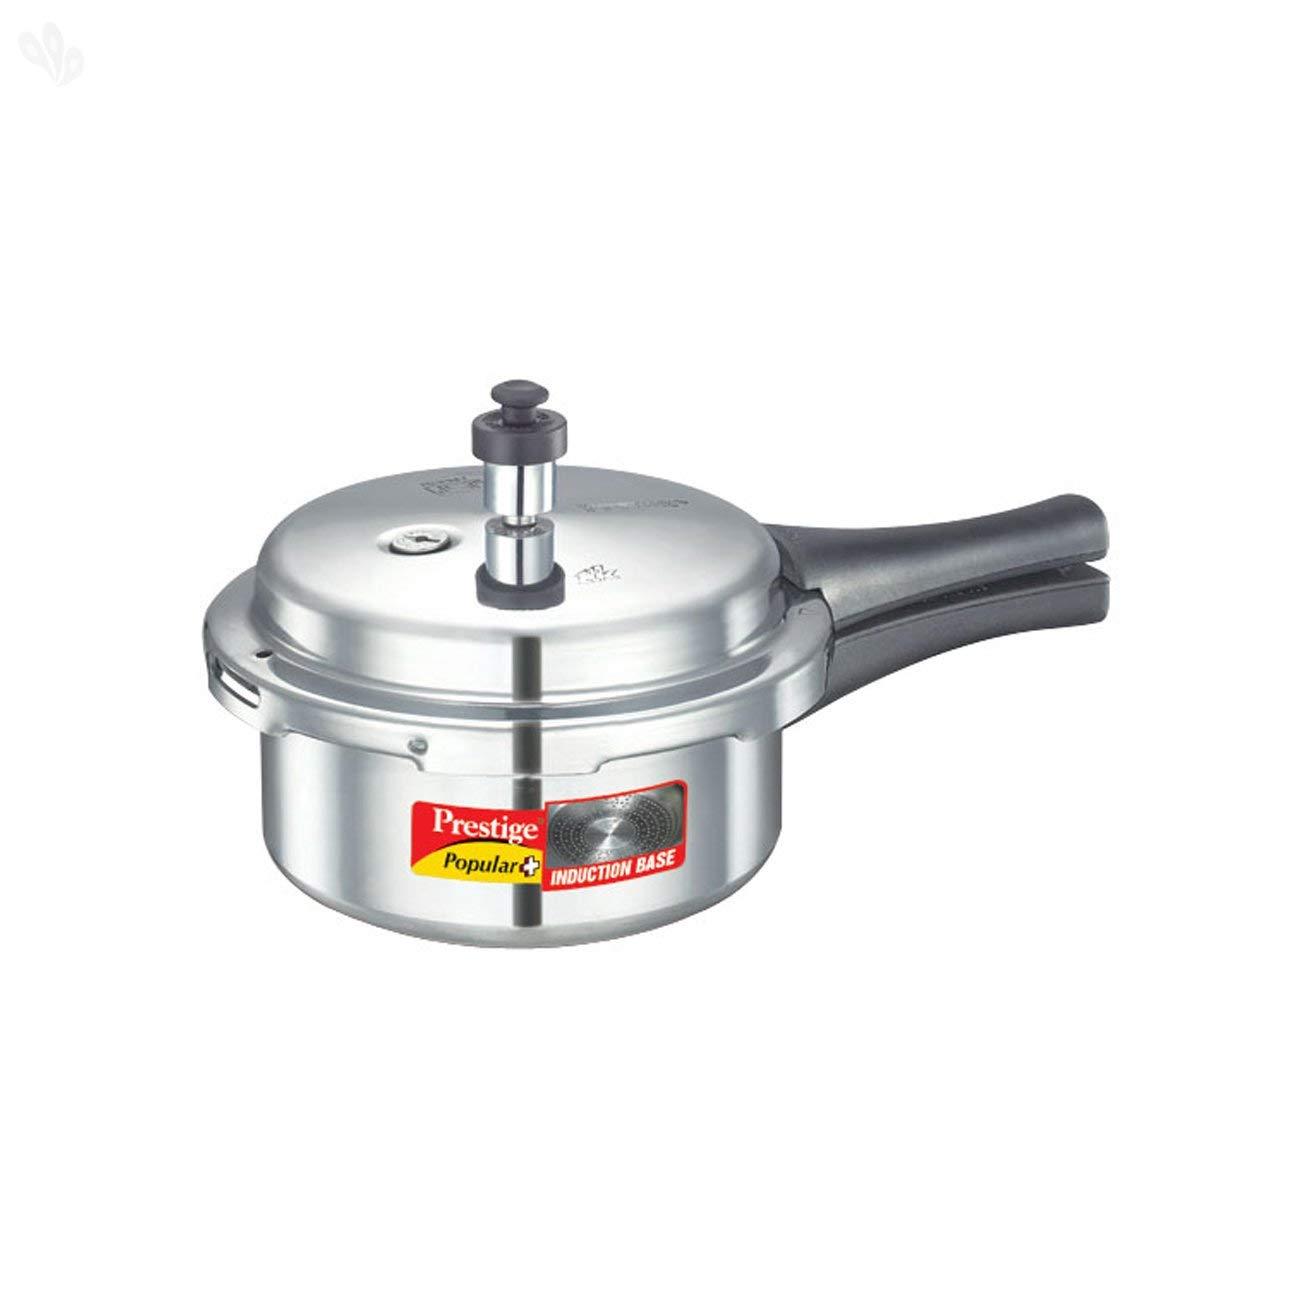 320ae947023 Buy Prestige Popular Plus Induction Base Pressure Cooker